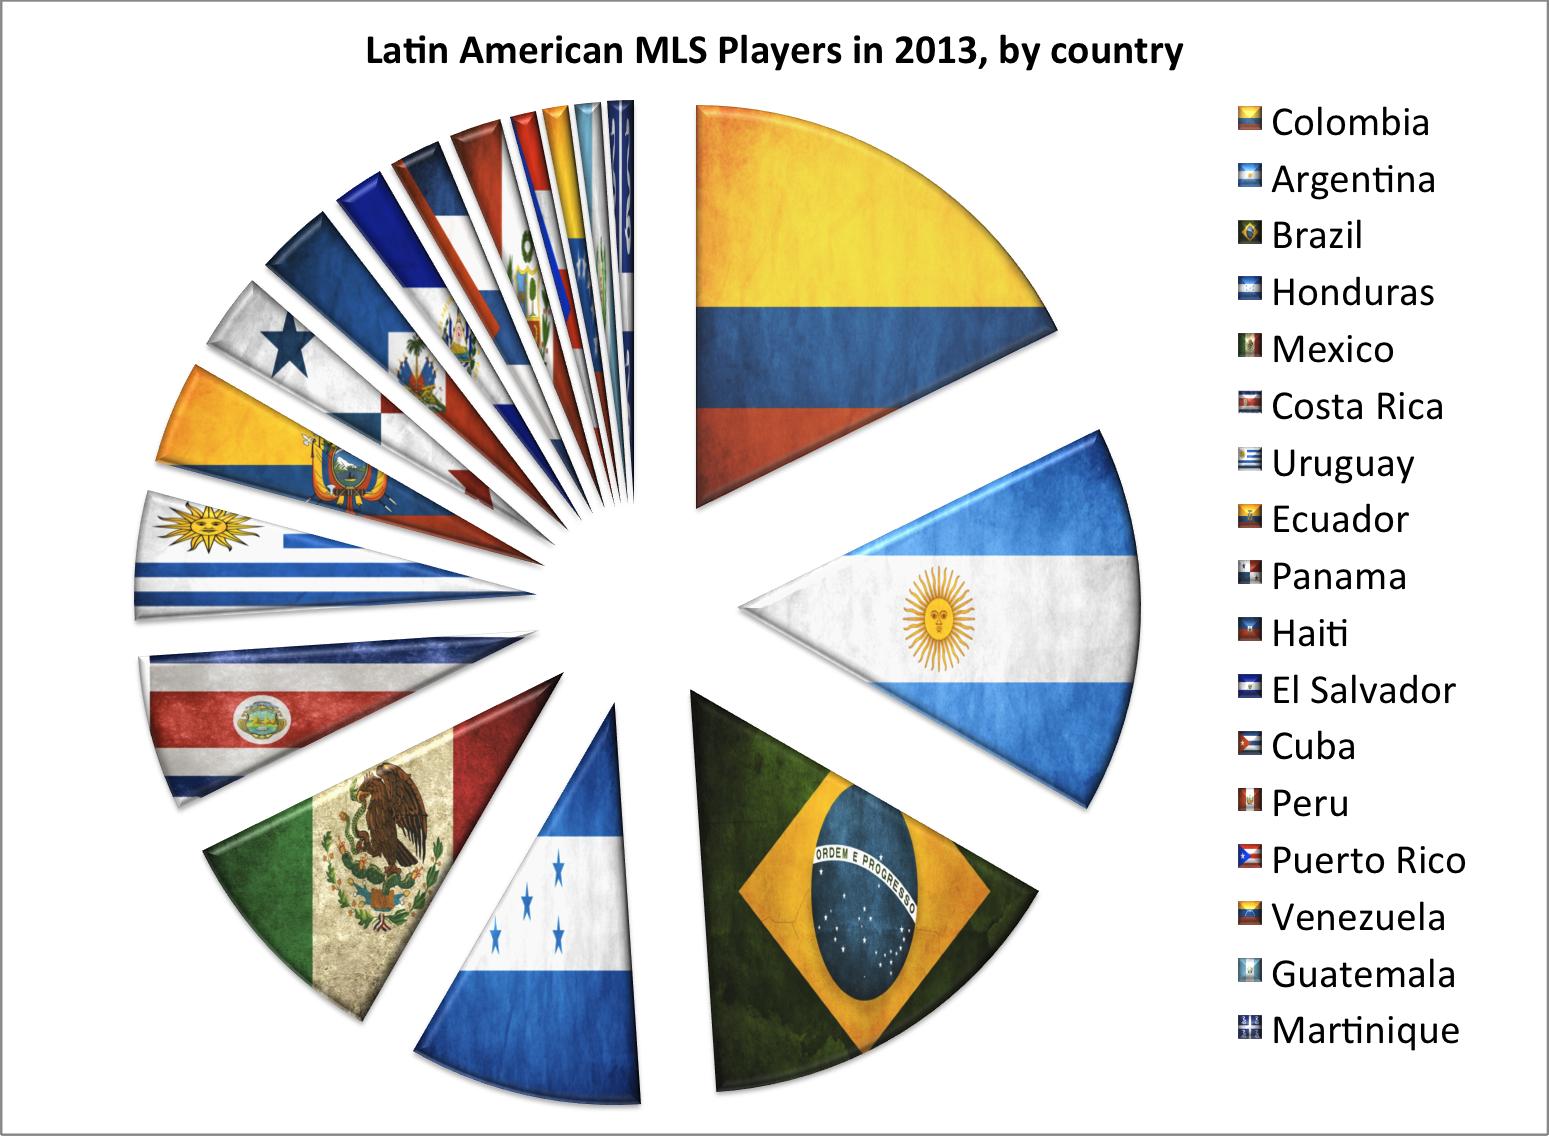 Breakdown of MLS players from Latin Amerinca countries in 2013. See below for numbers.